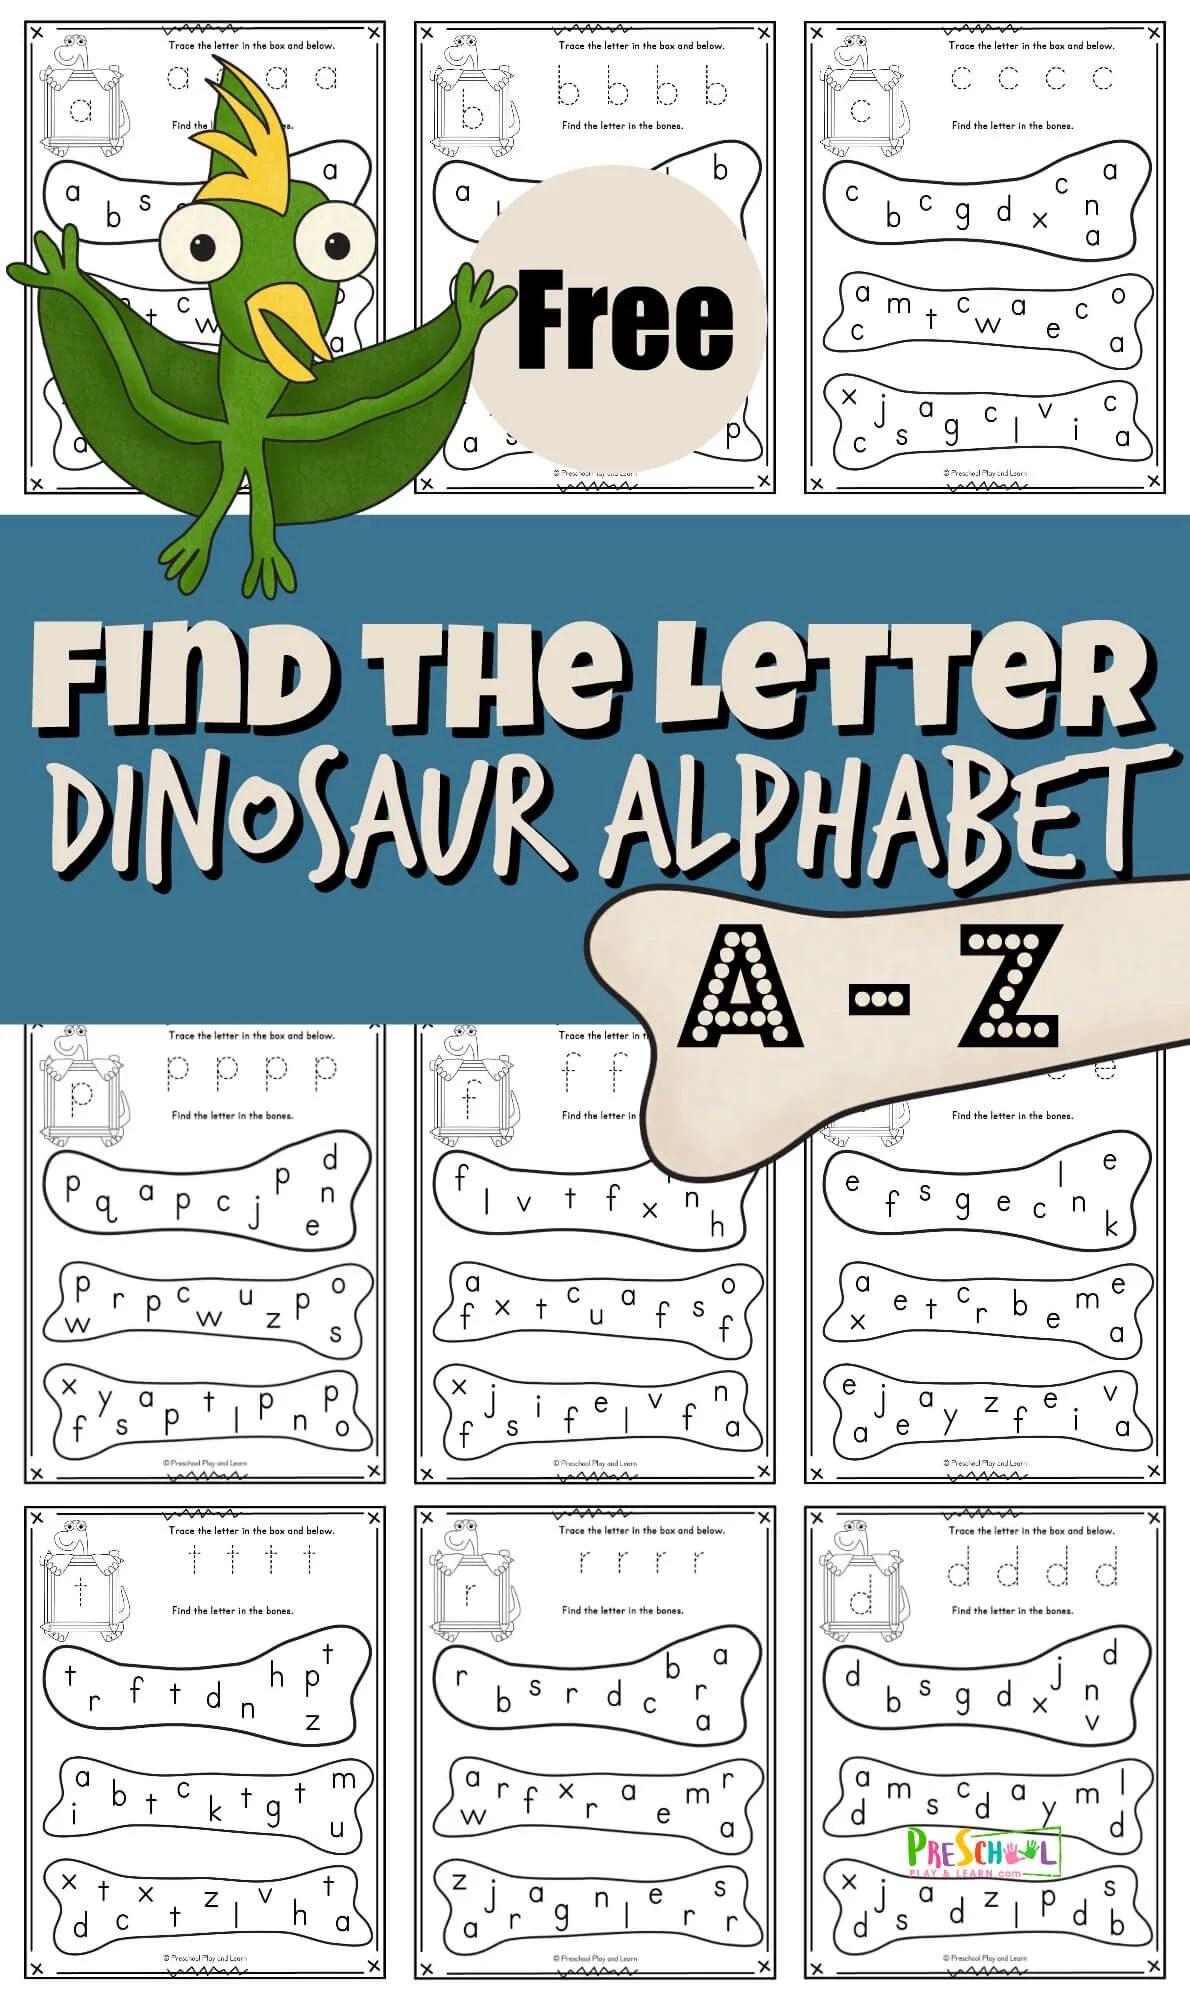 free find the letter dinosaur alphabet fun